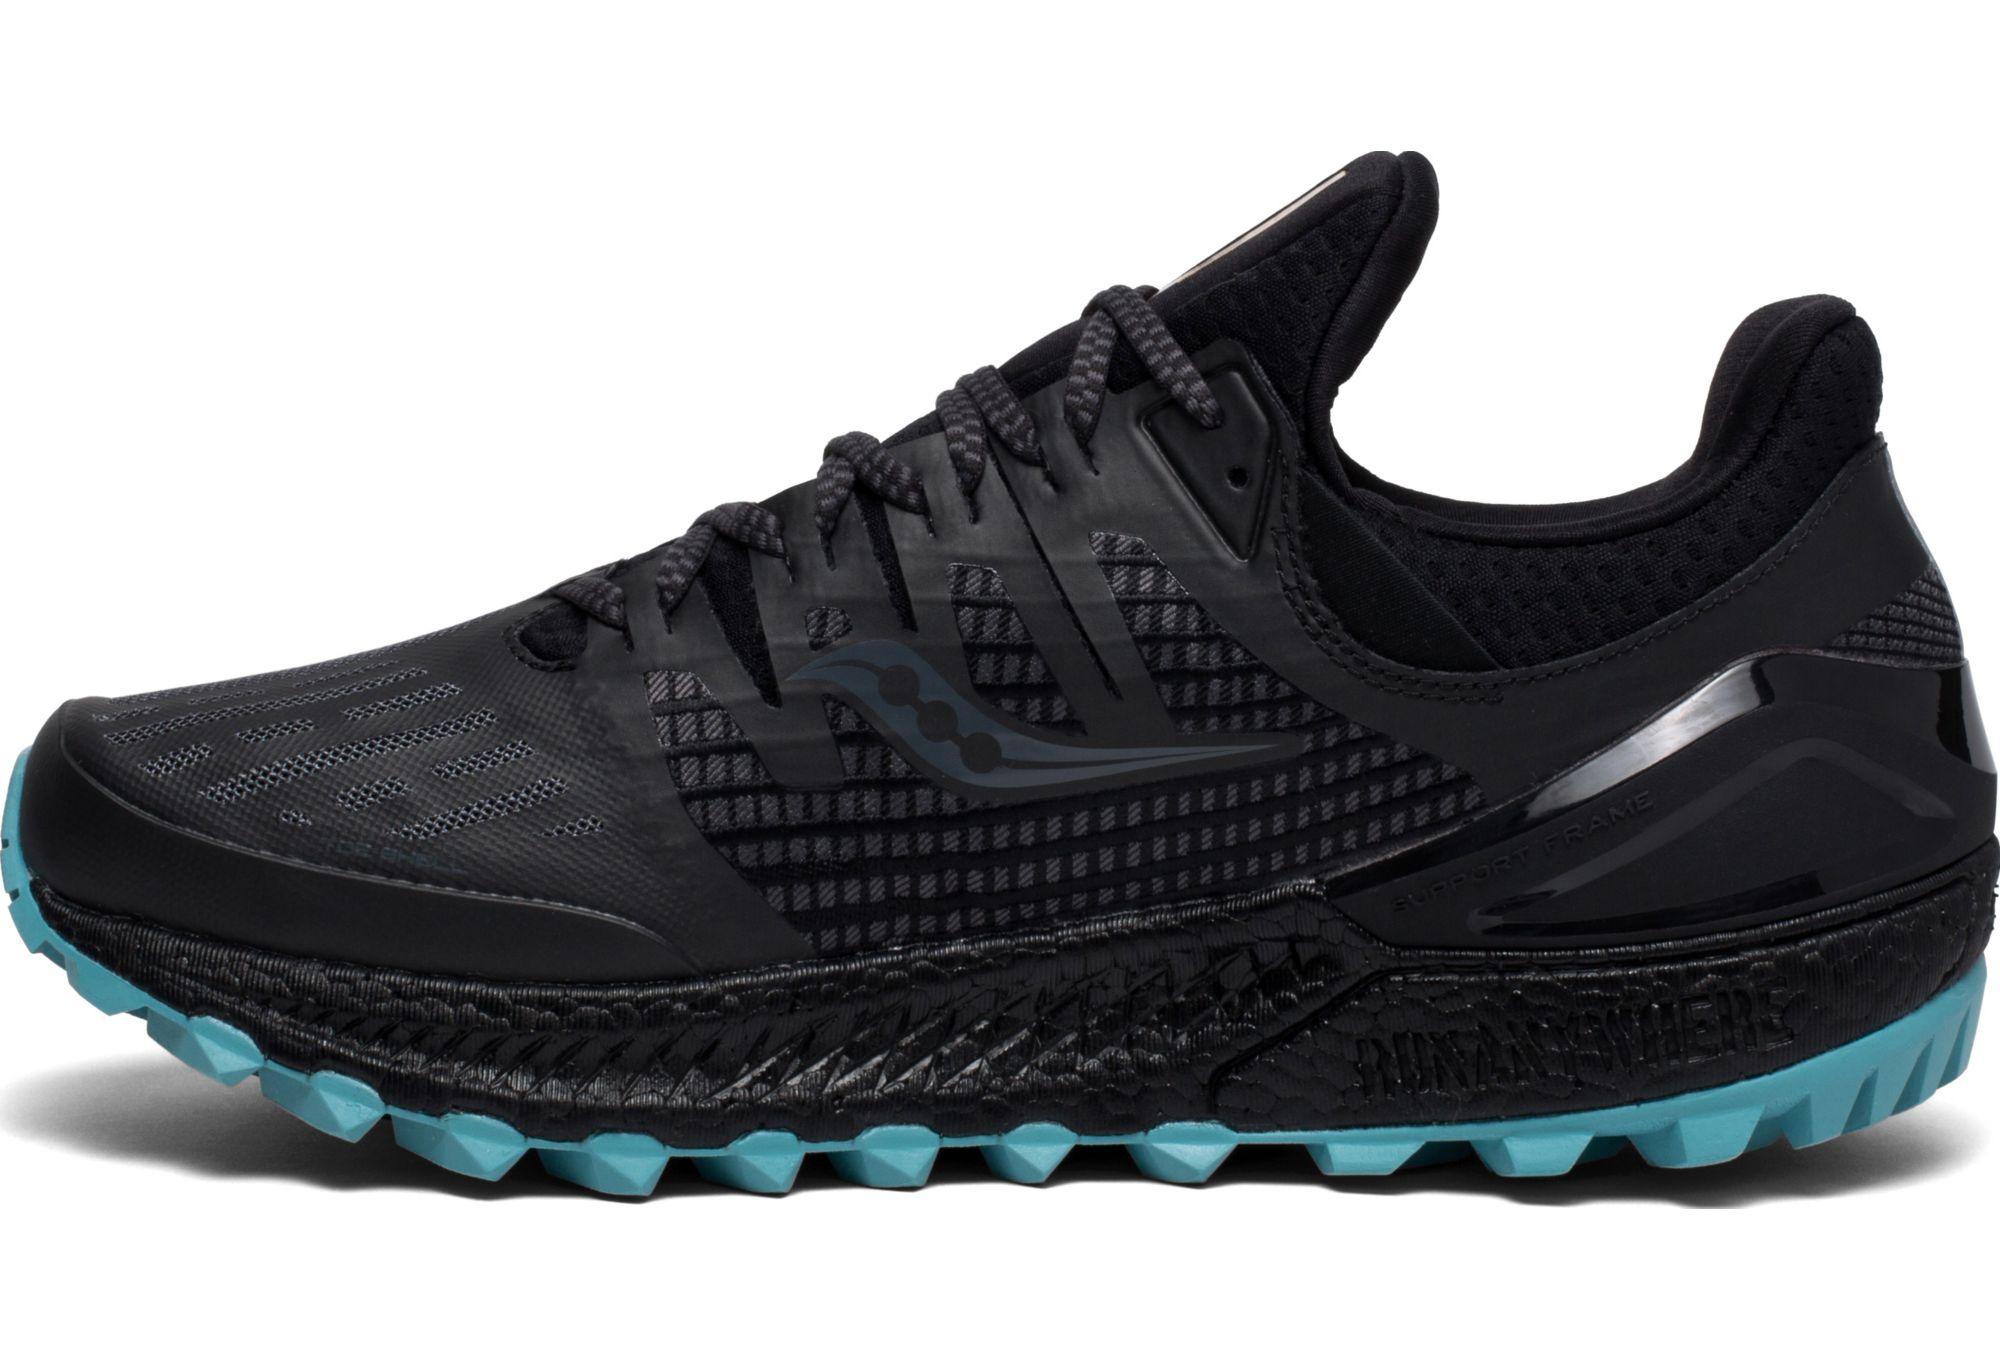 Chaussures de Running Comp/étition Femme Saucony Xodus Iso 3